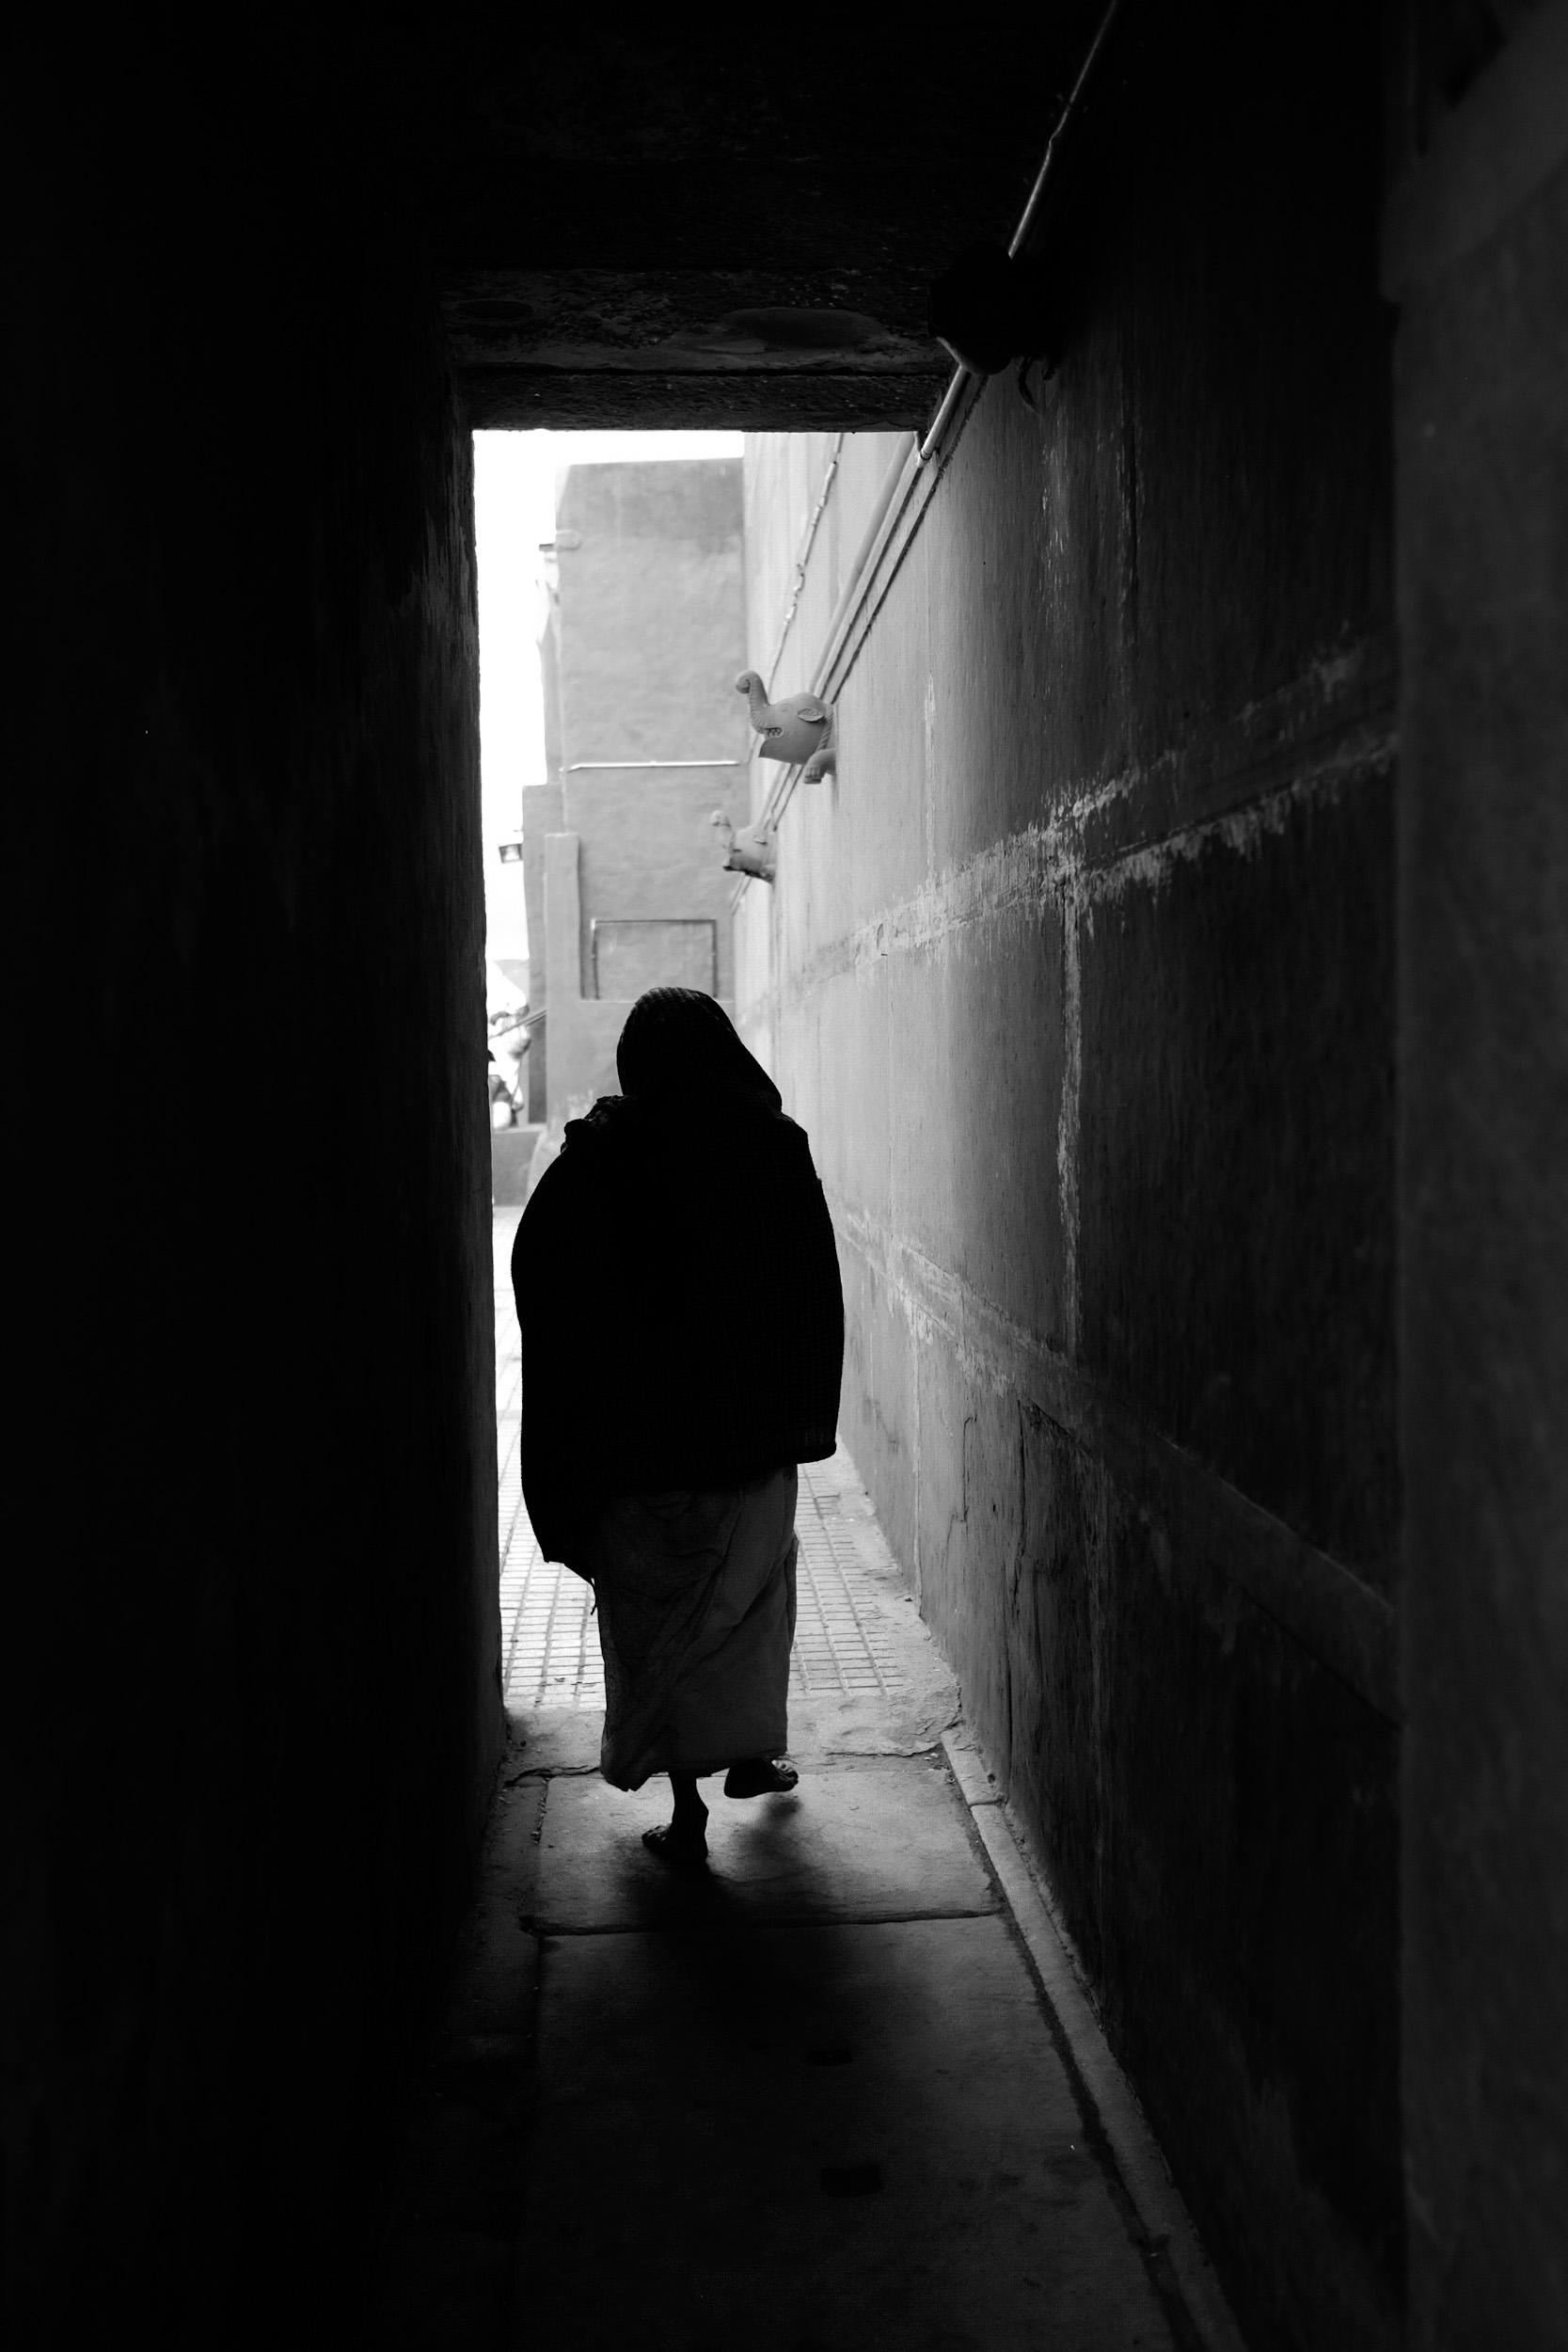 Sindhur_Photography_Travel_People_Holi-21.JPG